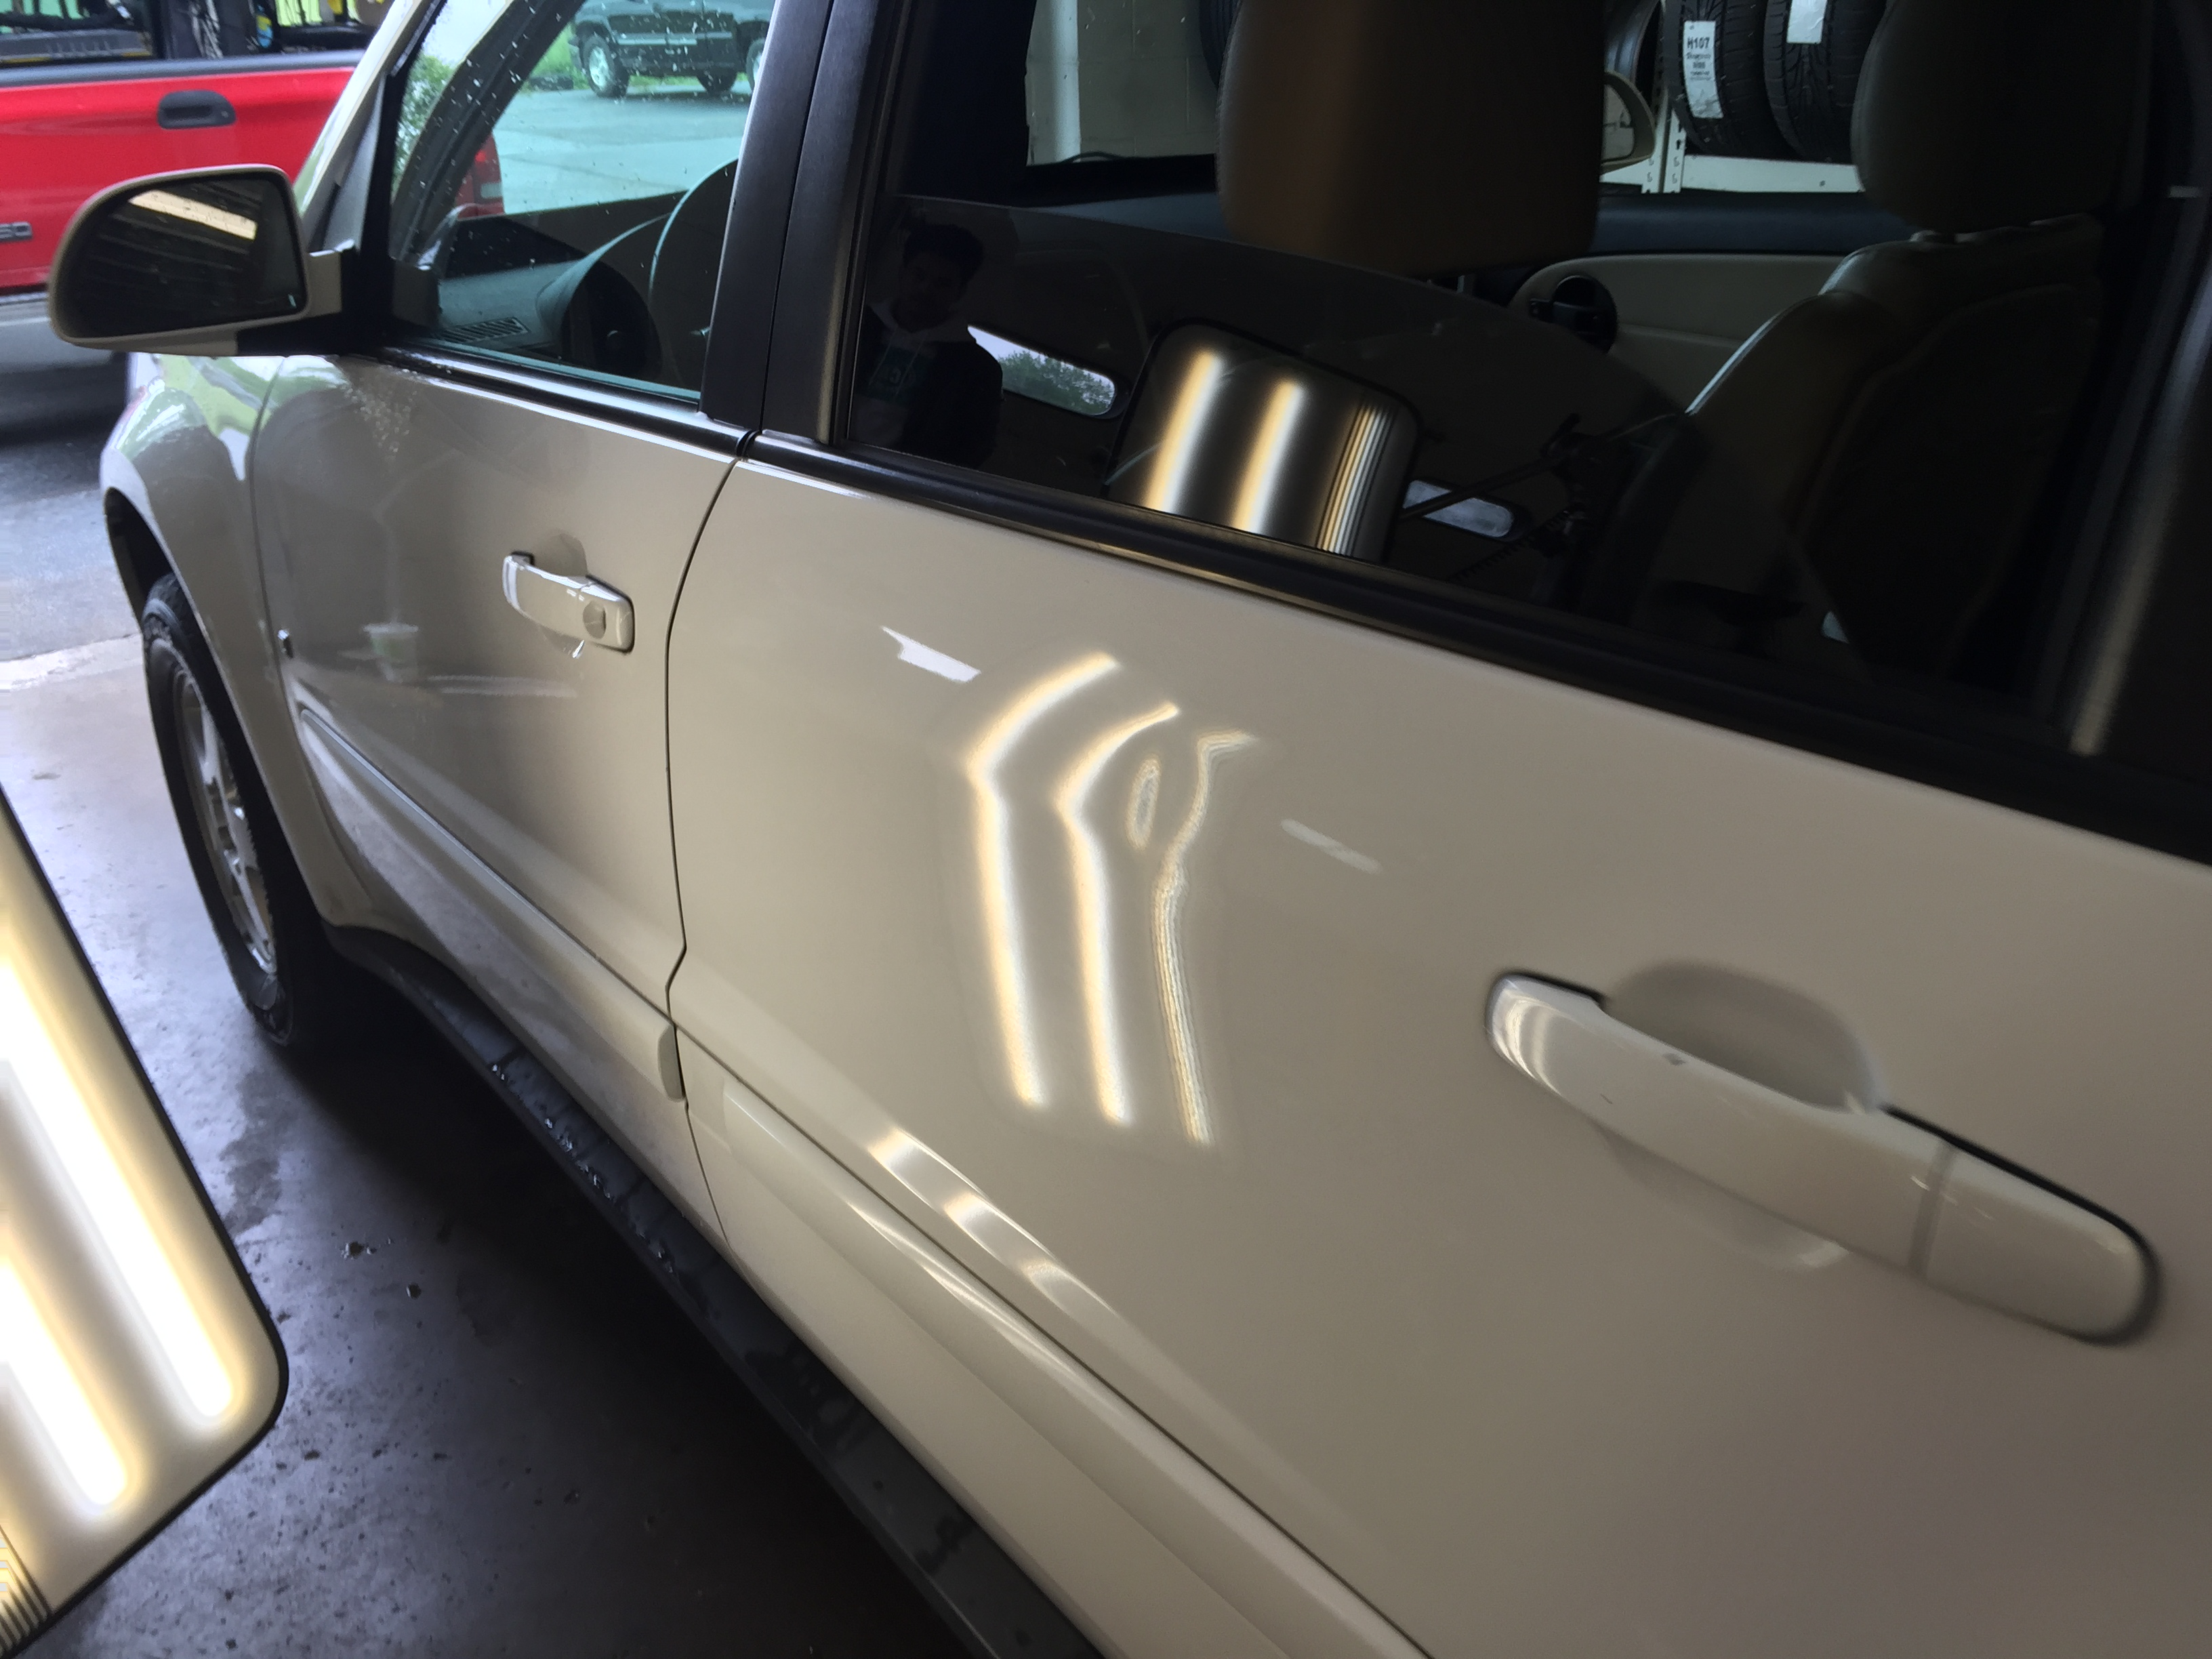 2009 White Torrent | Large Dent Drivers Rear Door. Work performed by Dent Expert Michael Bocek from 217dent.com. 217hail.com